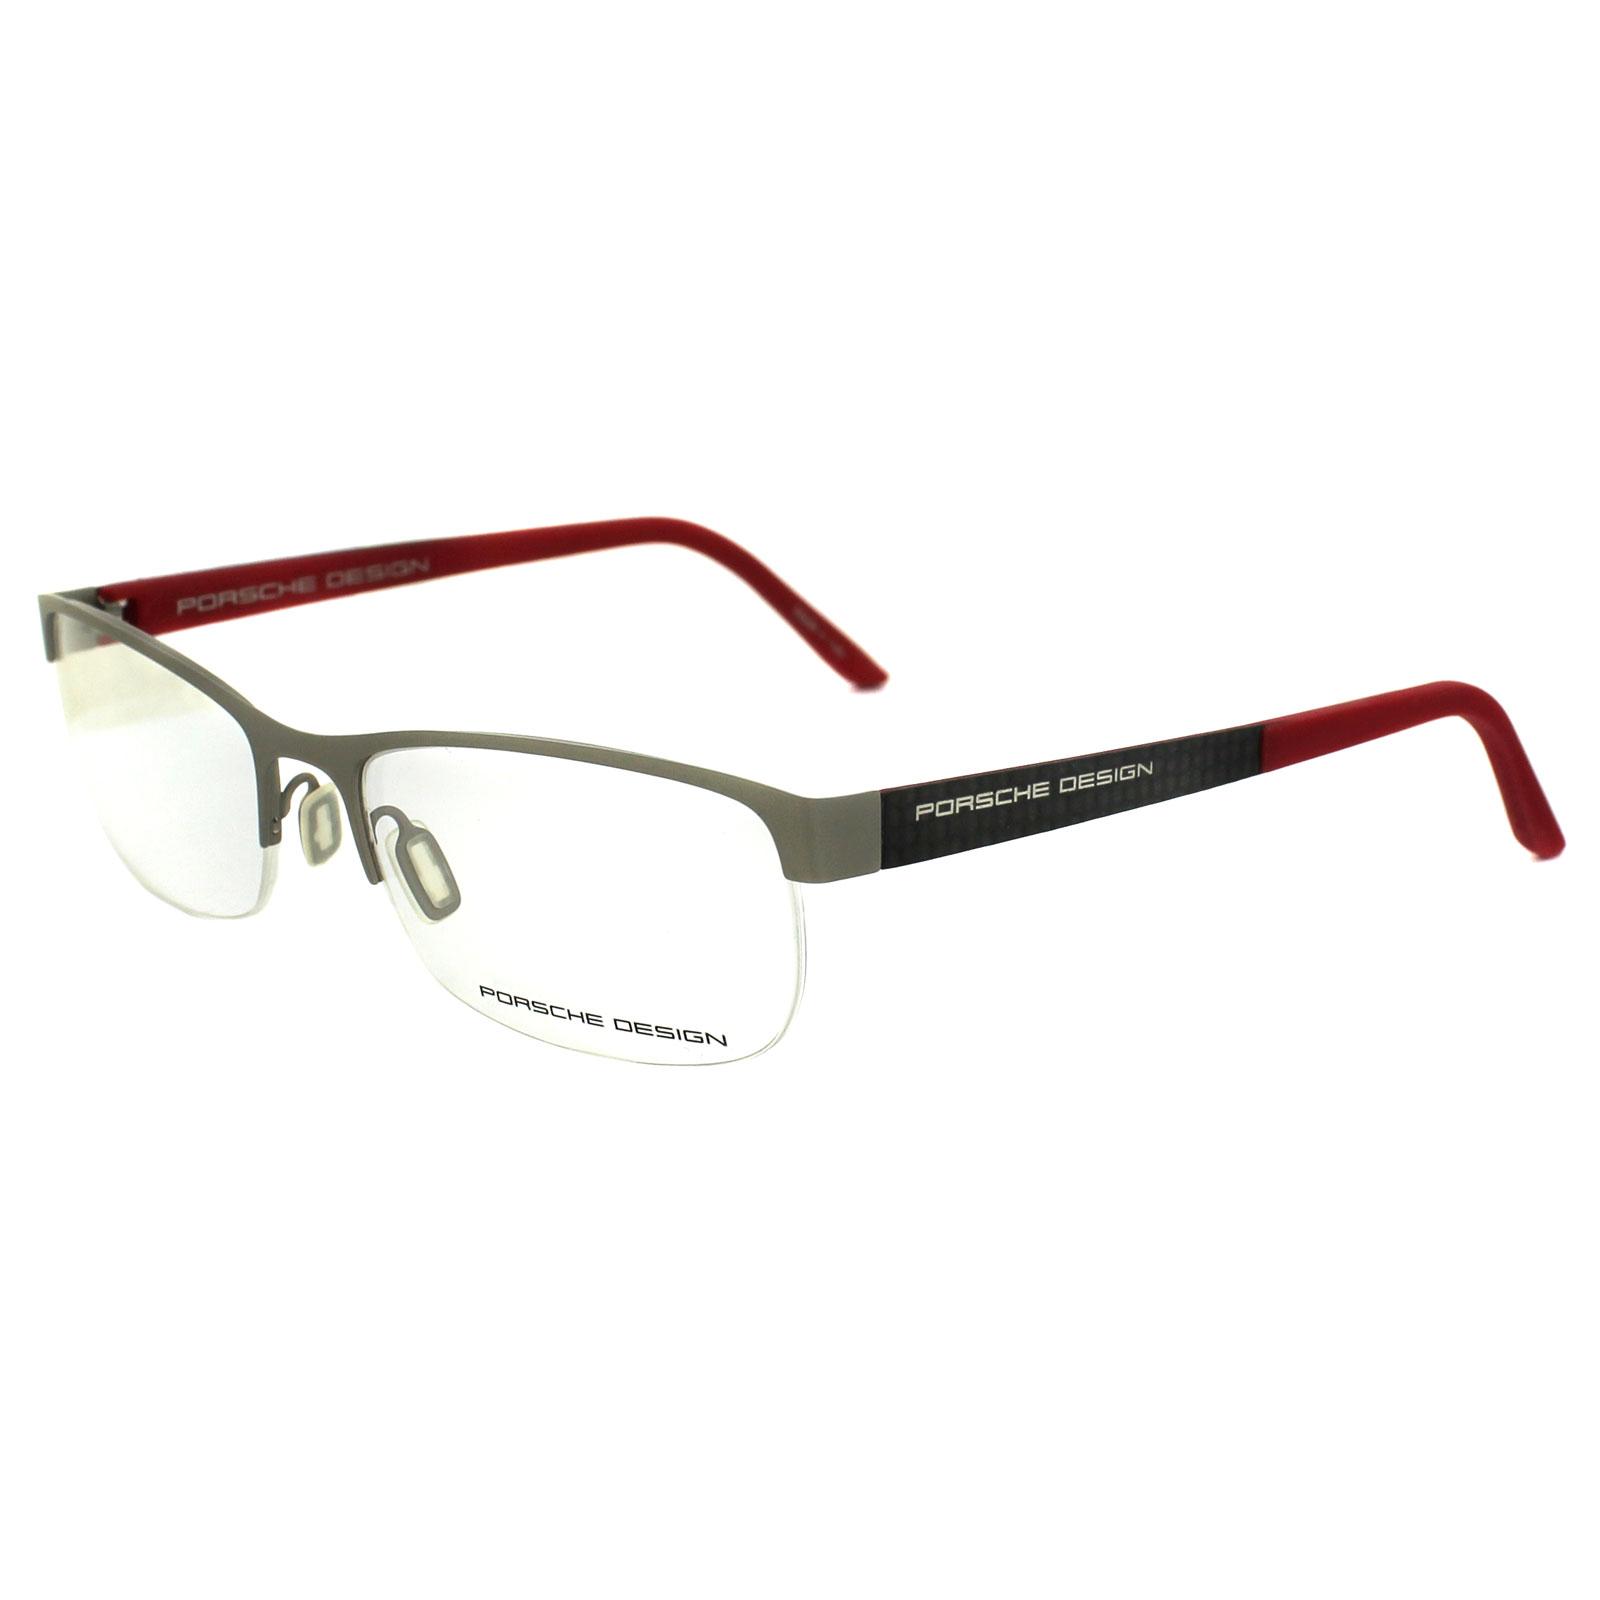 cheap porsche design p8242 glasses frames discounted